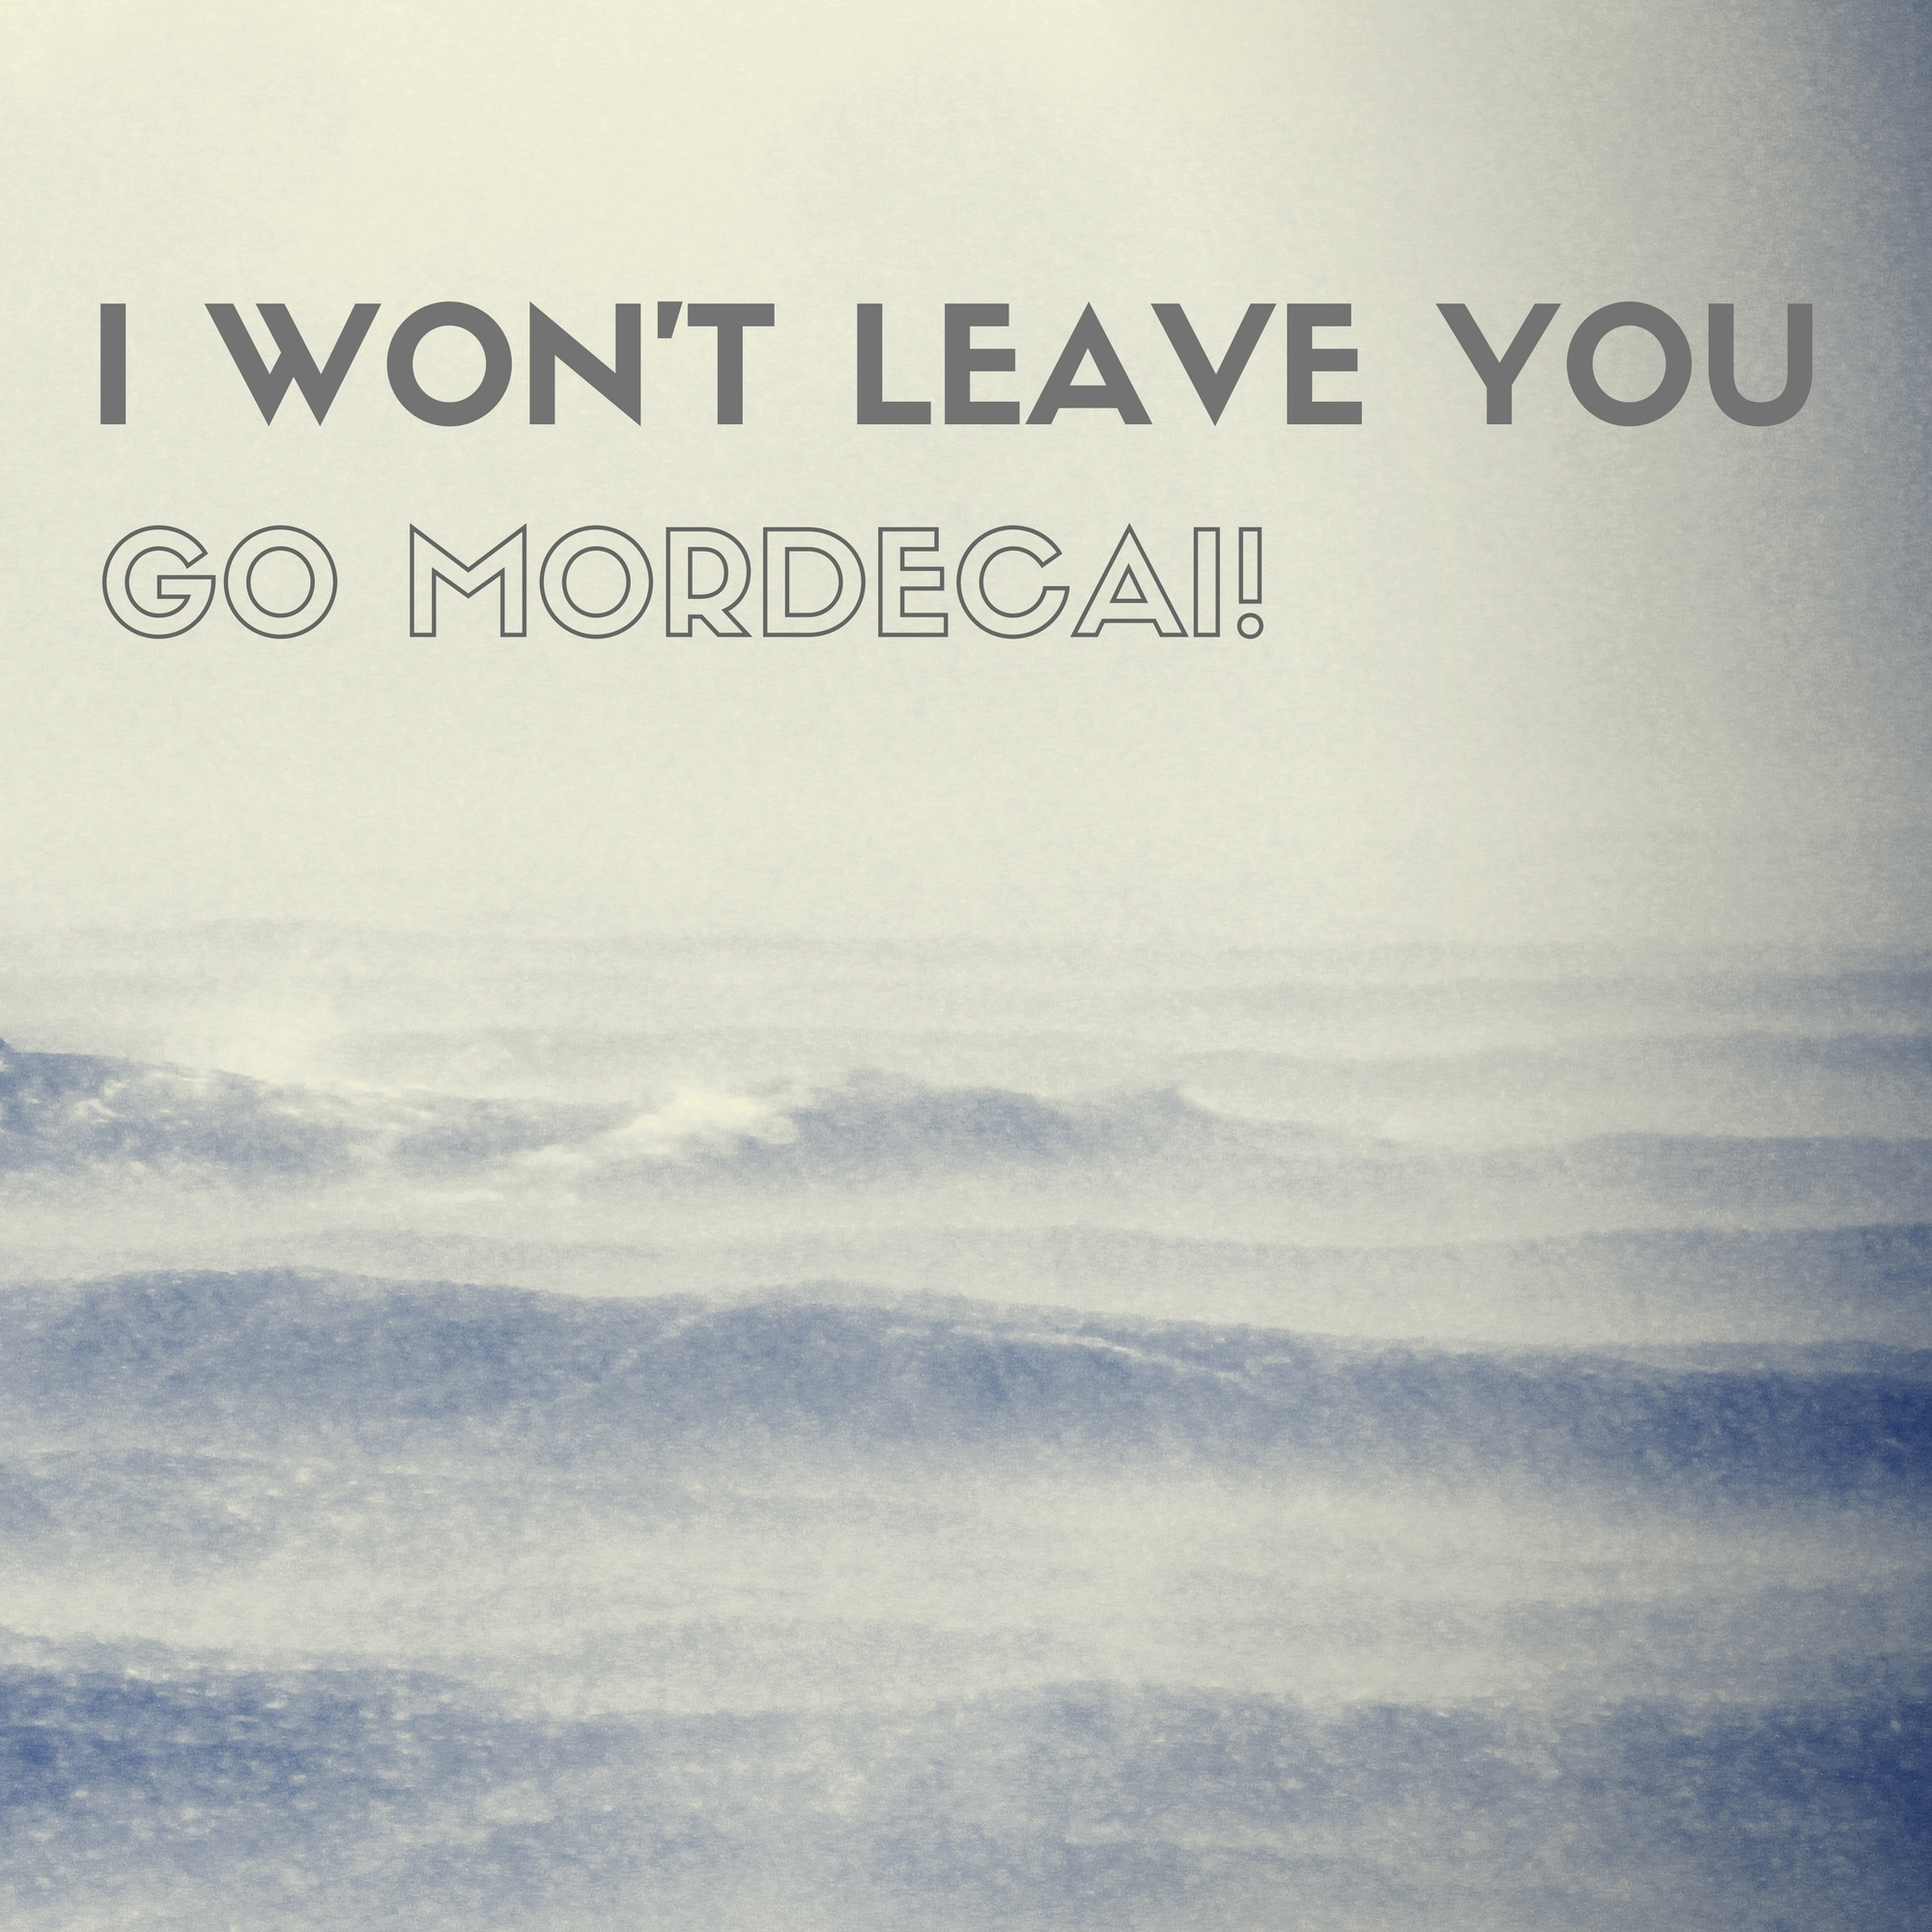 I WON'T LEAVE YOU.jpg